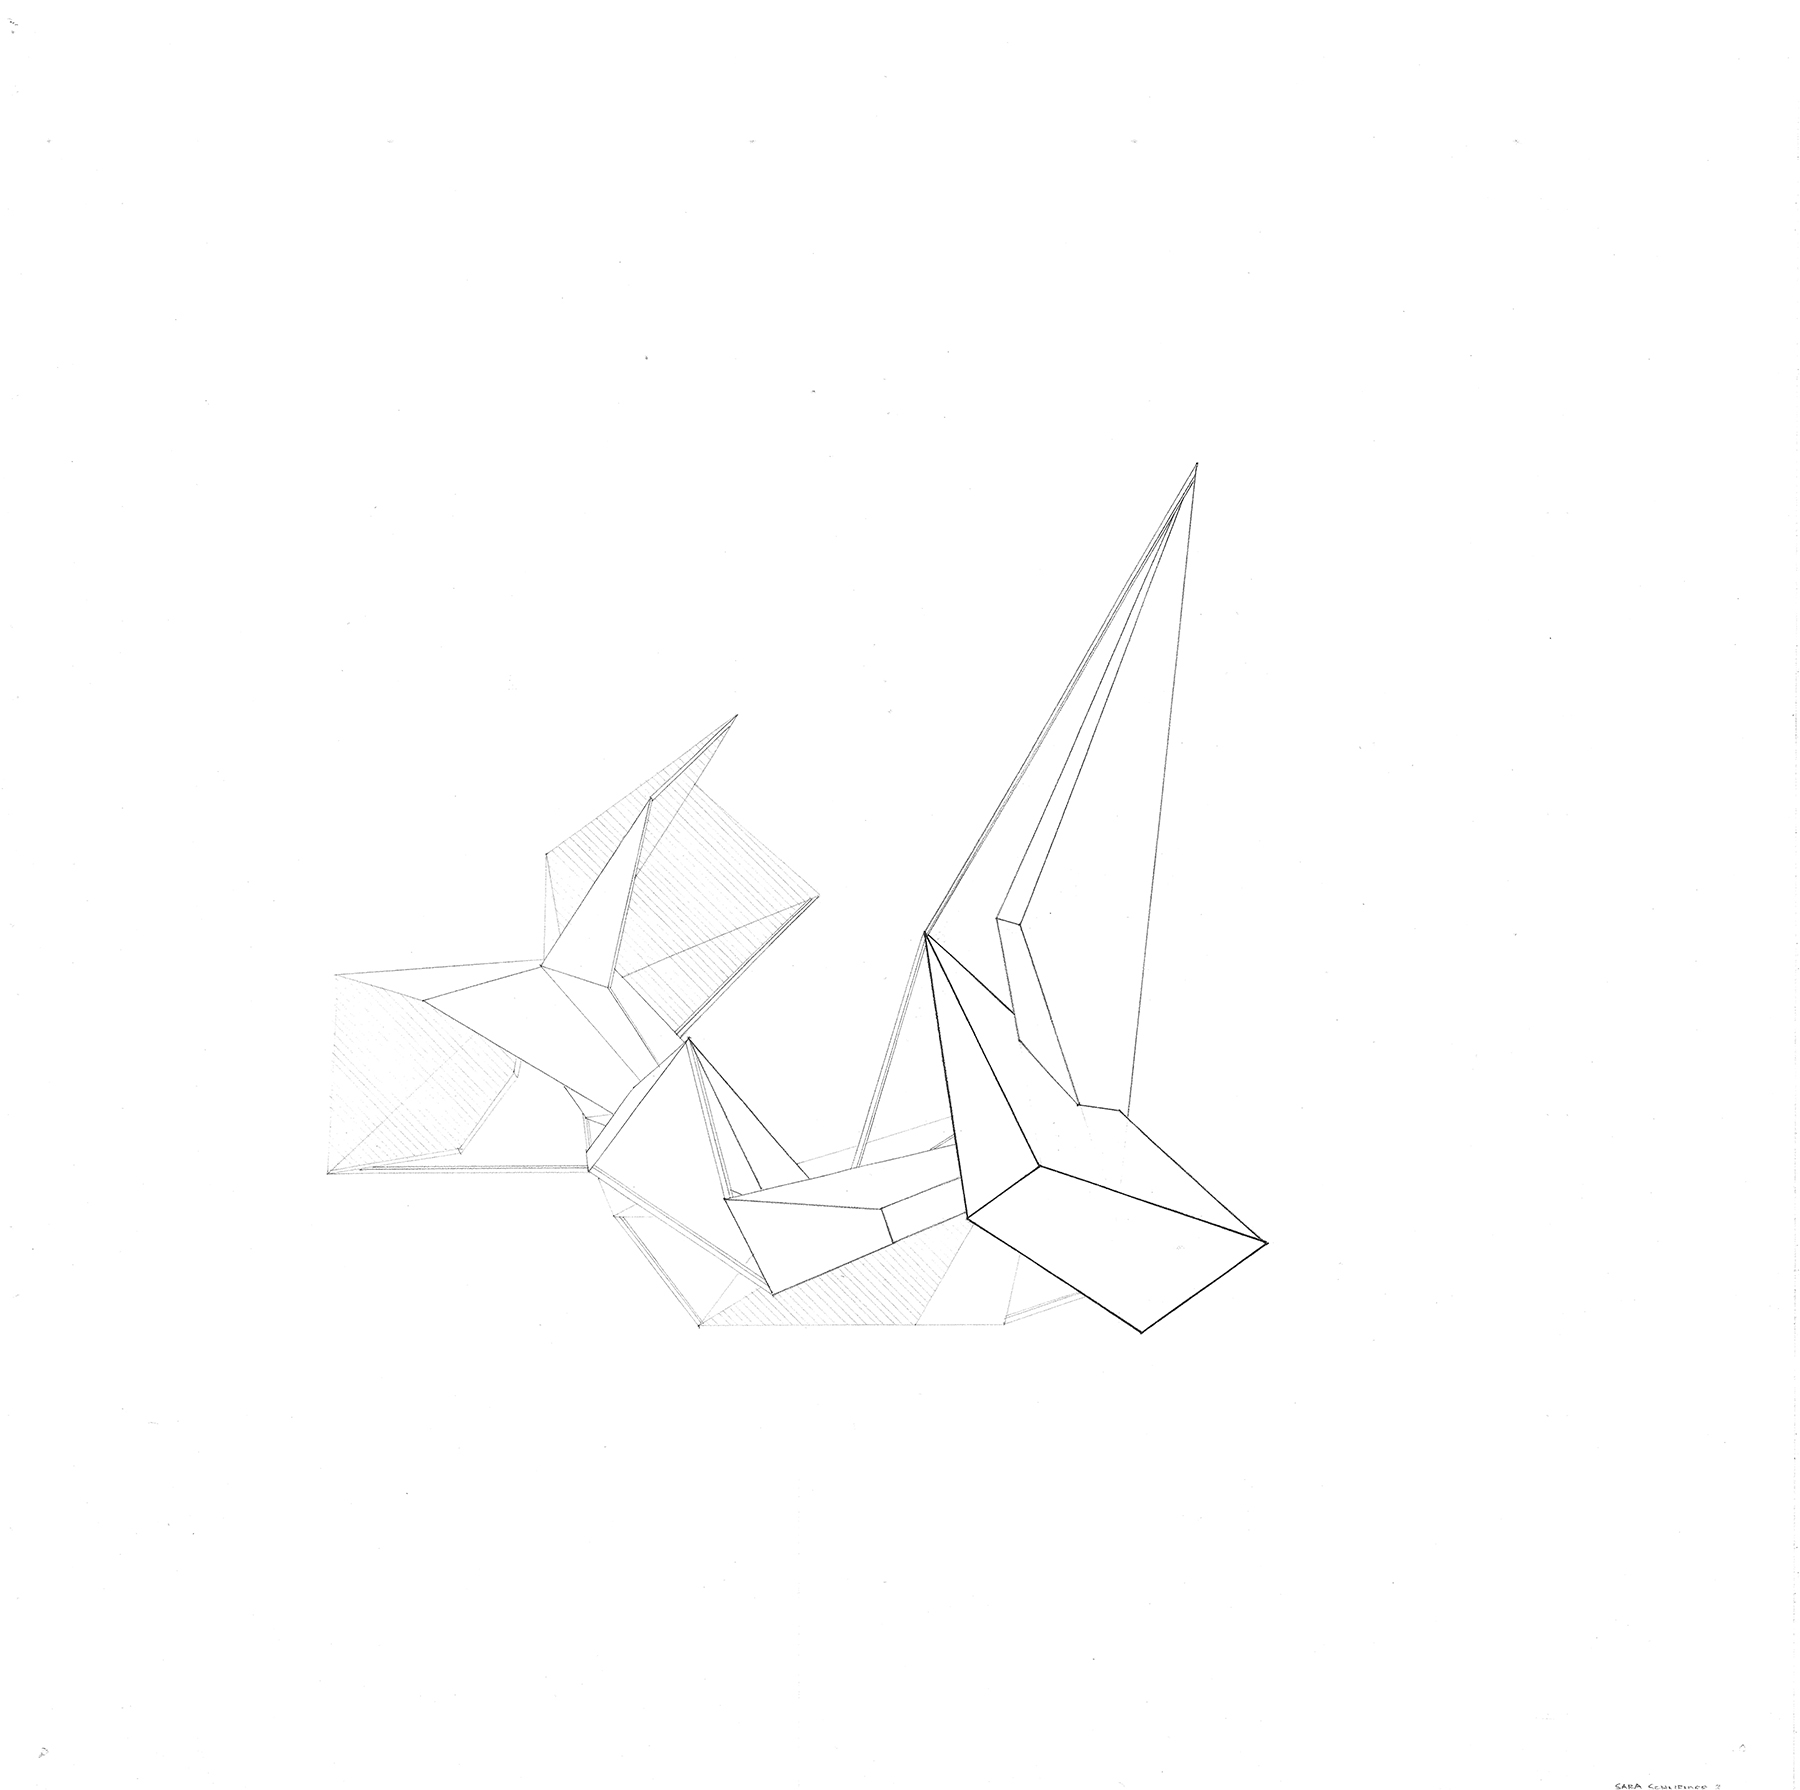 FA11_SSCHNEIDER_201-03_p1B-4w.jpg